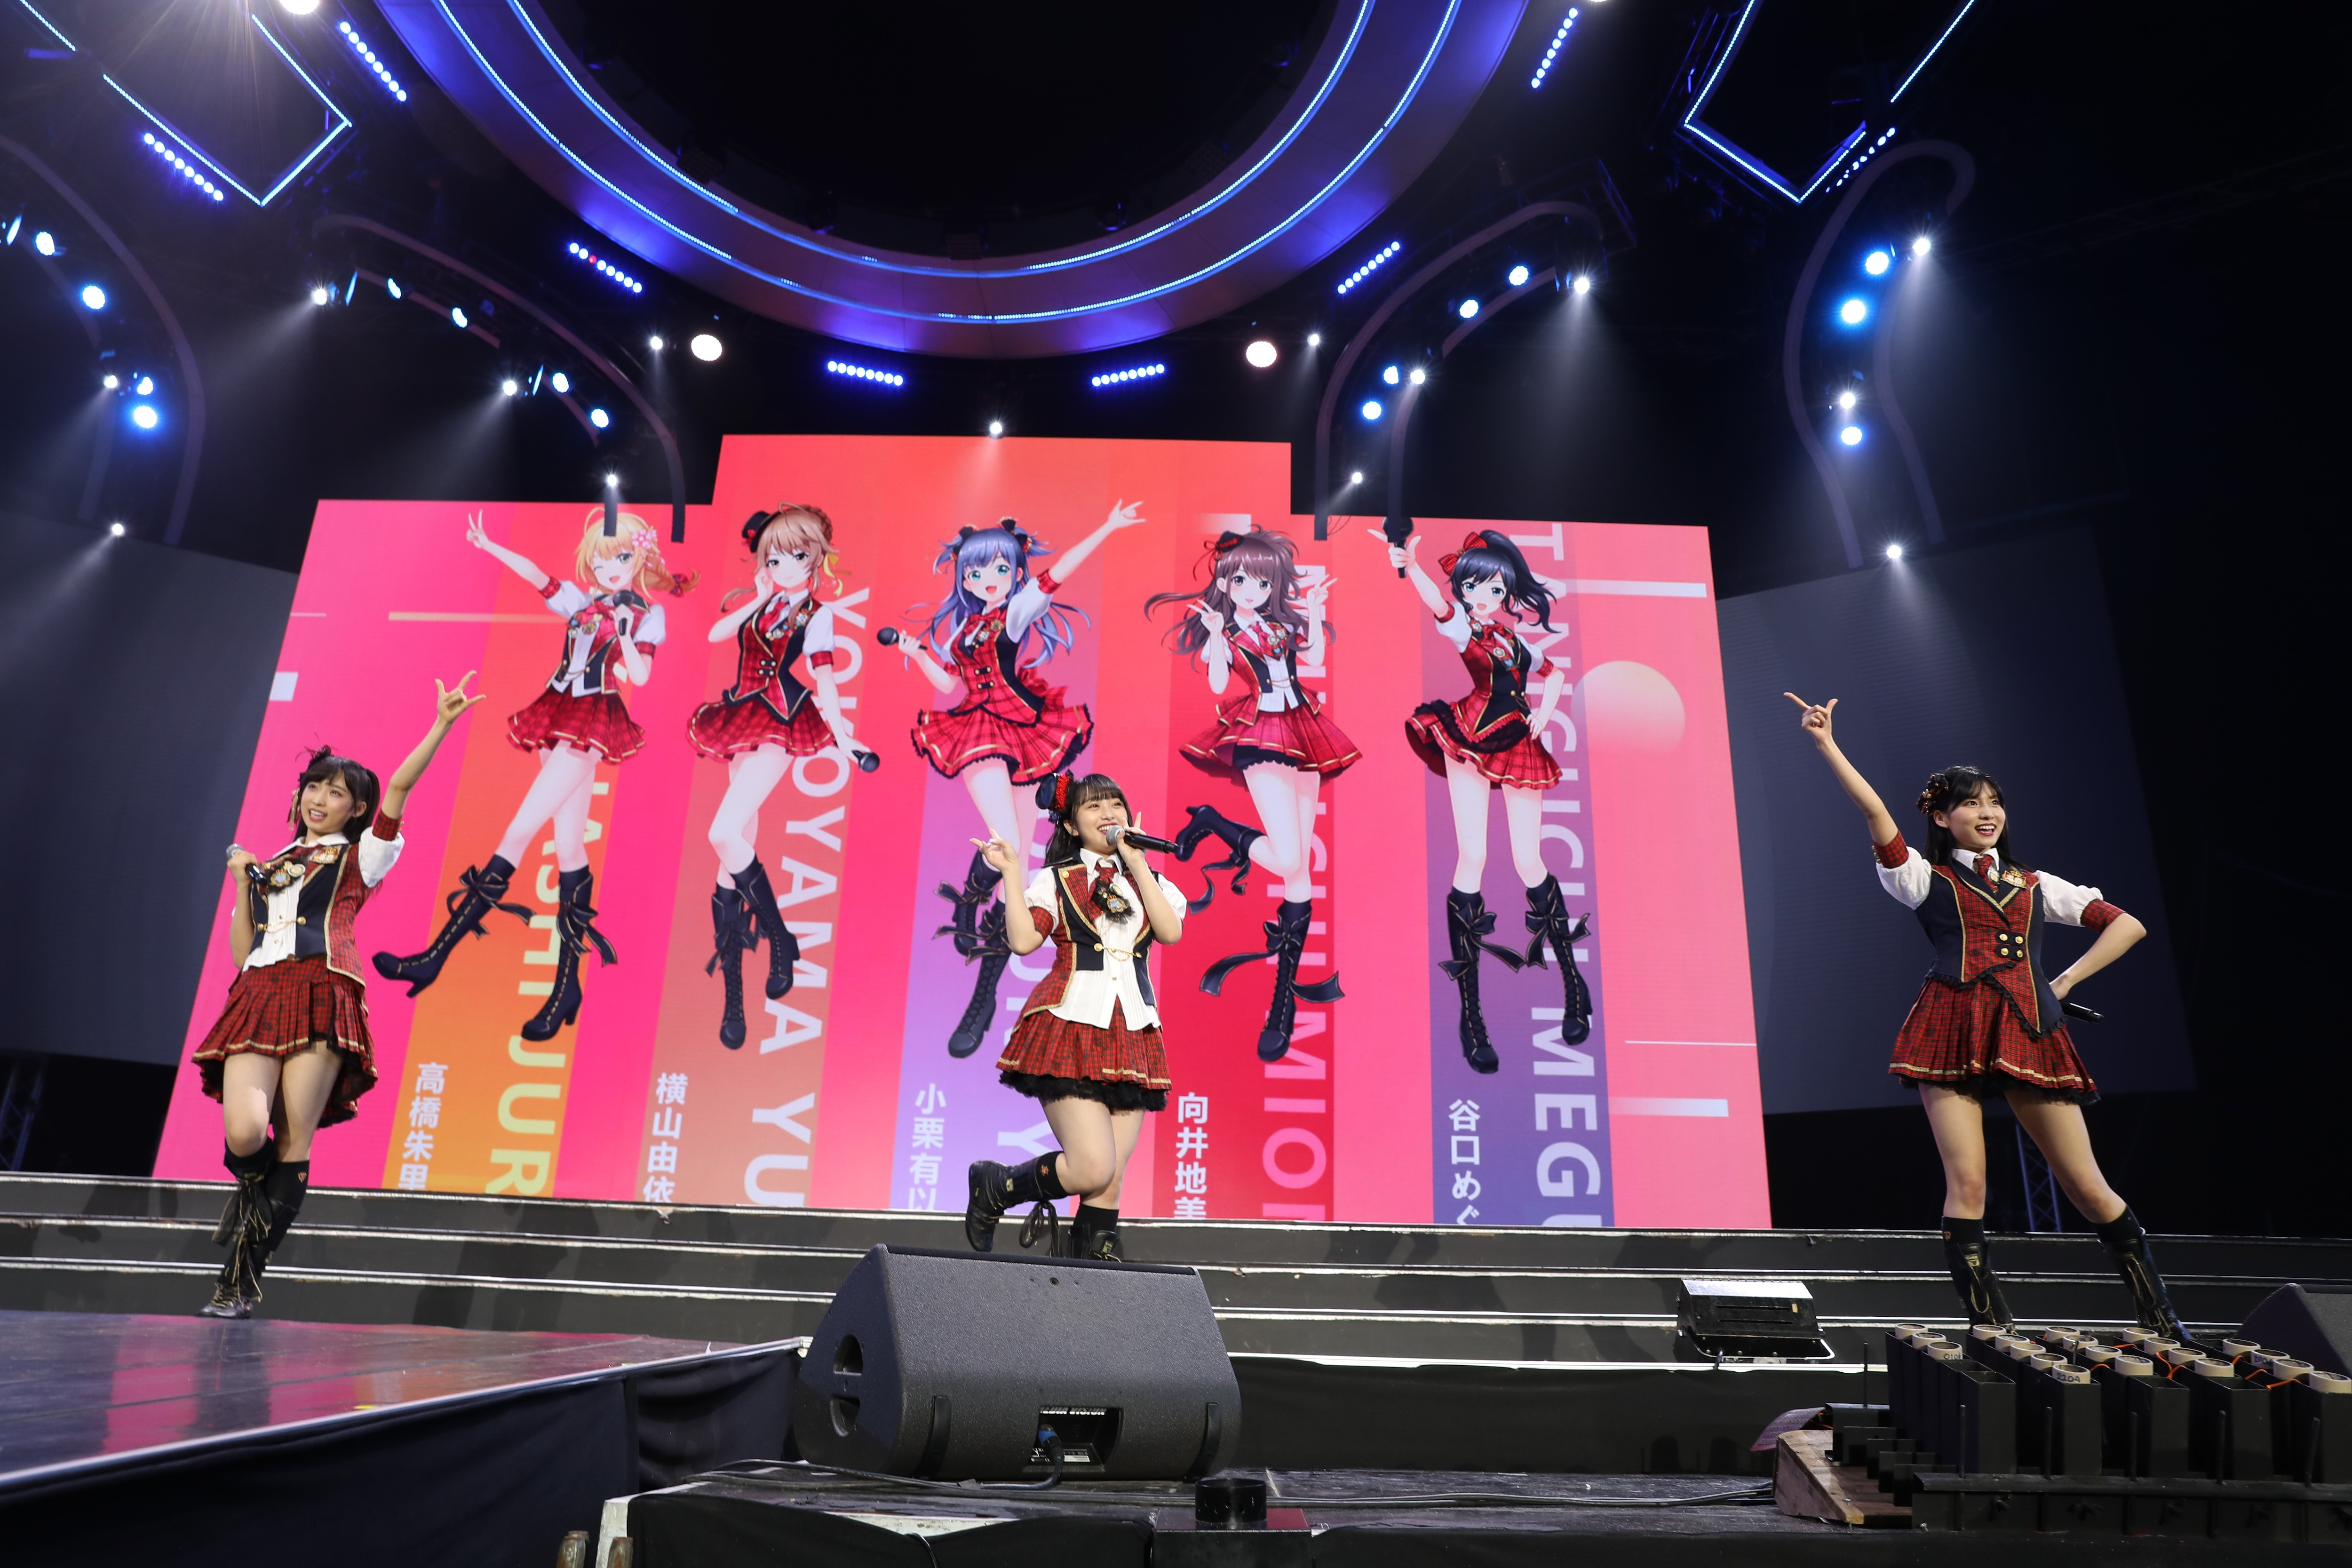 AKB48ほか、海外の姉妹グループが集結し『恋するフォーチュンクッキー』を熱唱!【写真23枚】の画像003